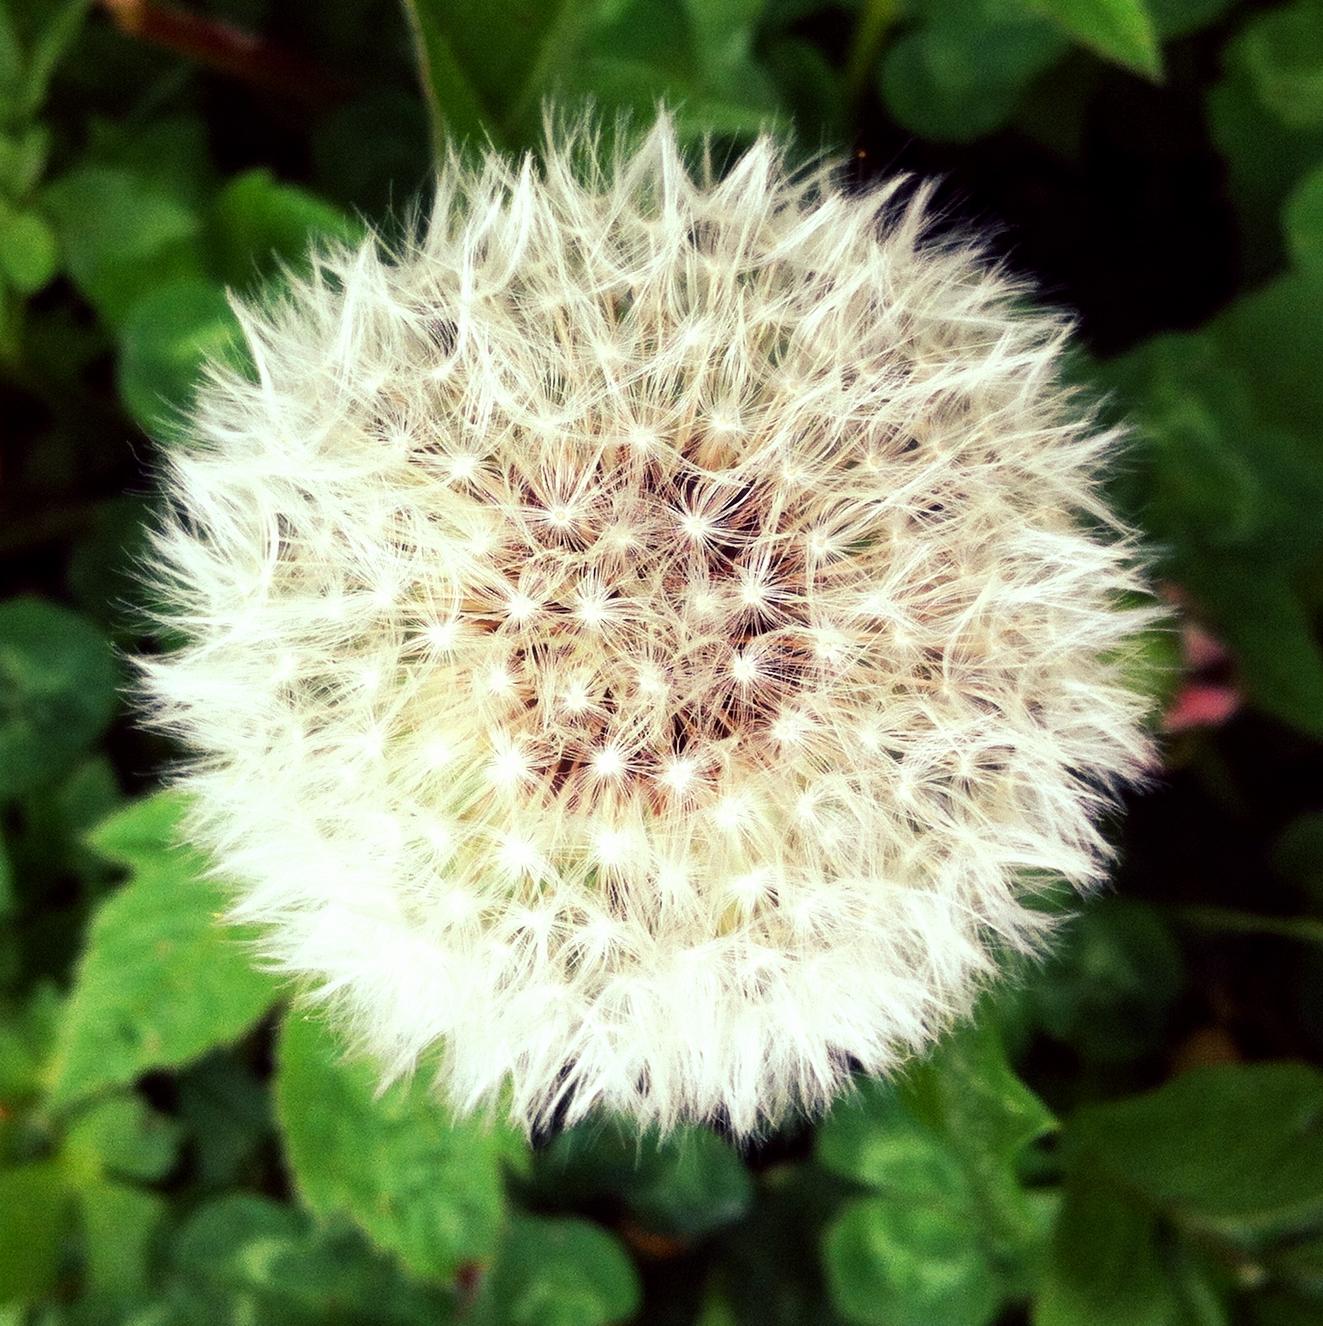 One_Spring_Wish